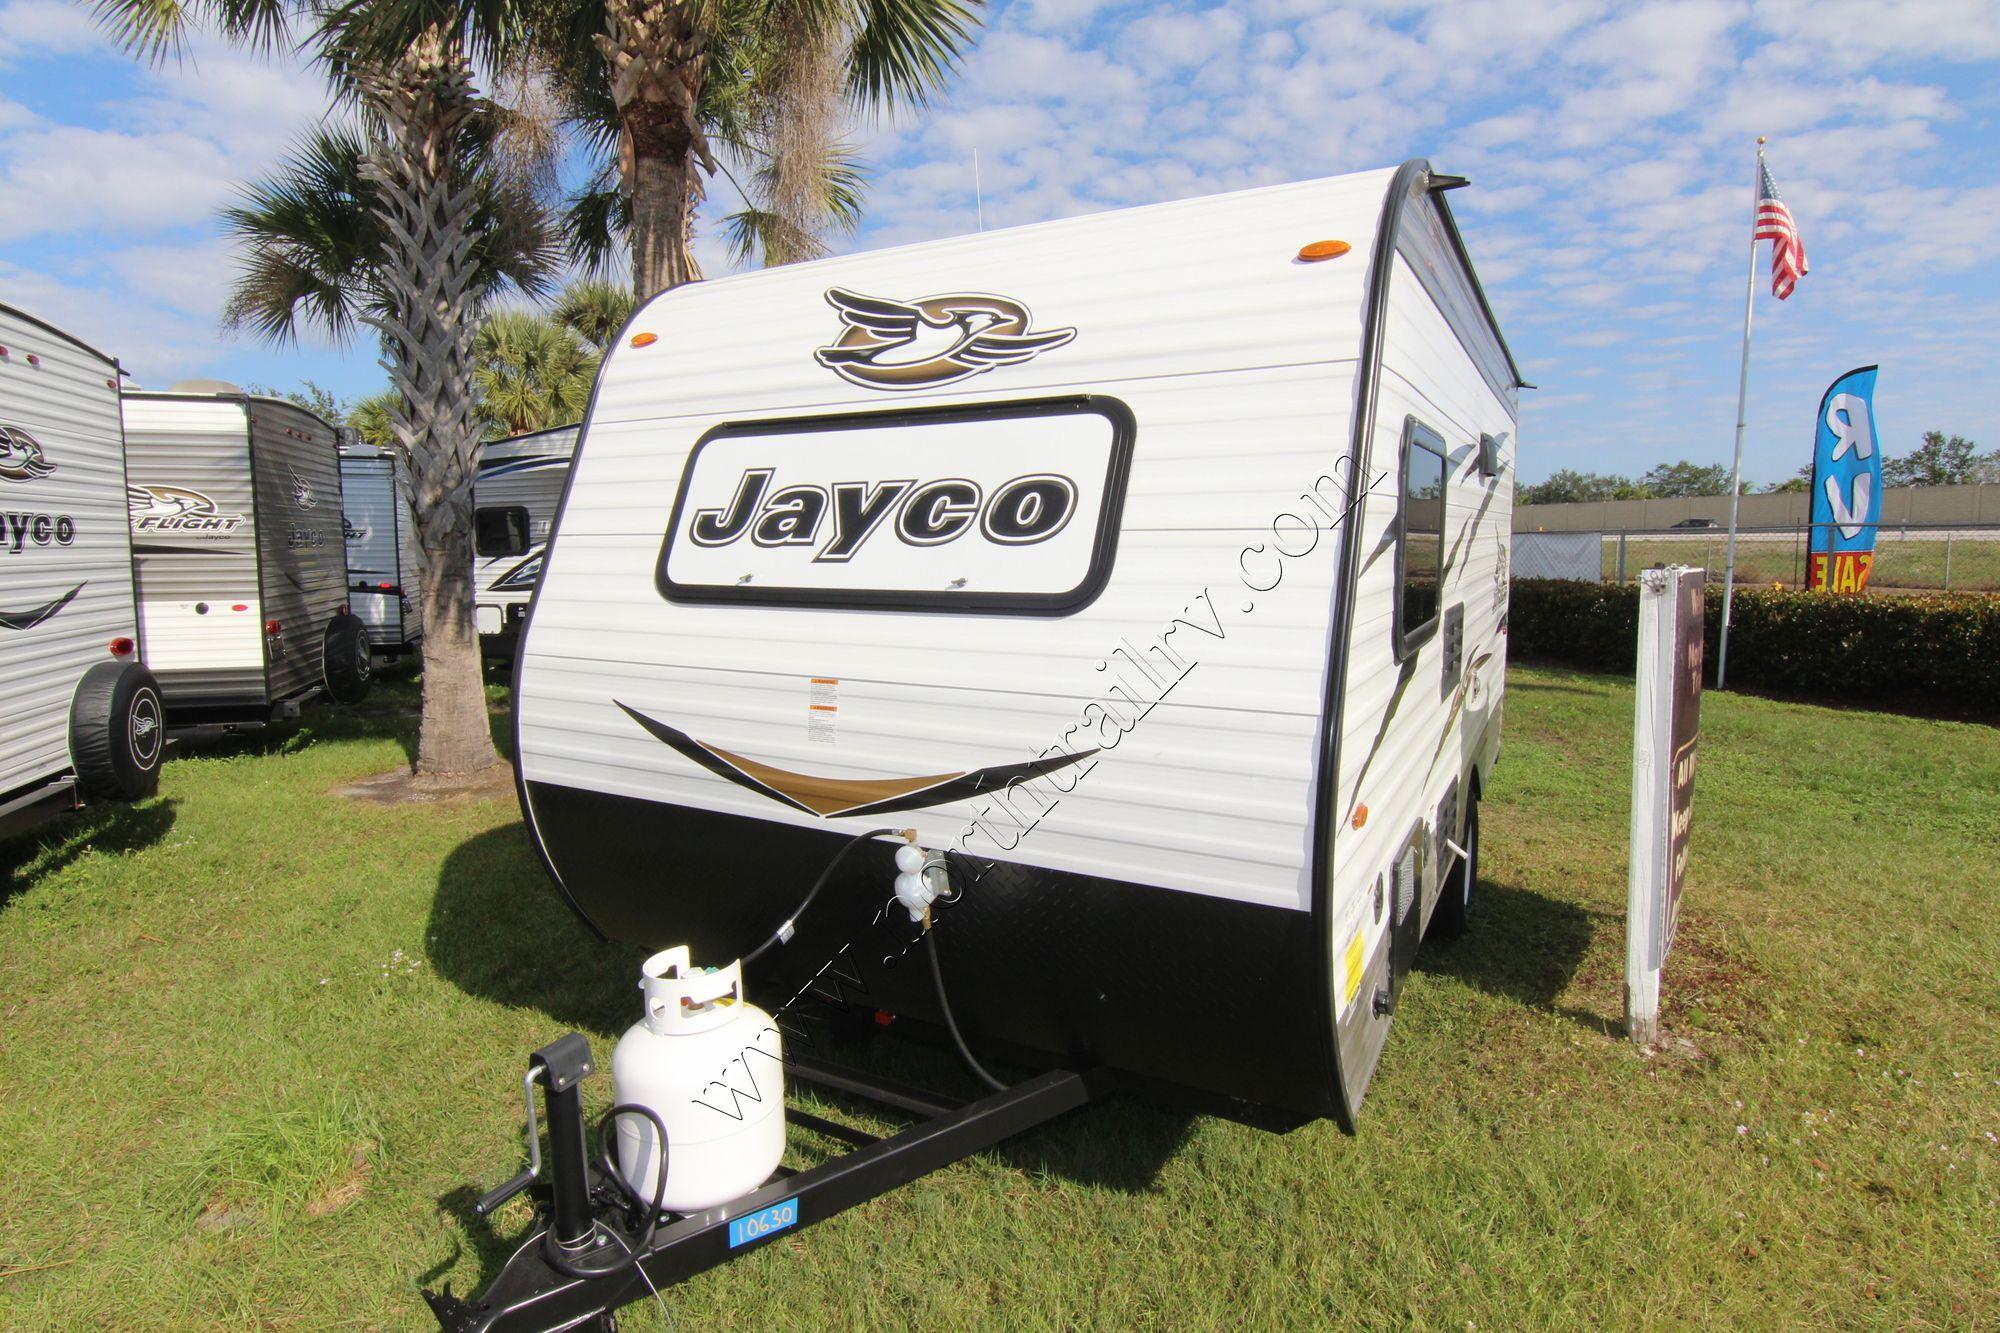 2018 Jayco Jay Flight Slx 154BH Travel Trailer (Stock# 10630)